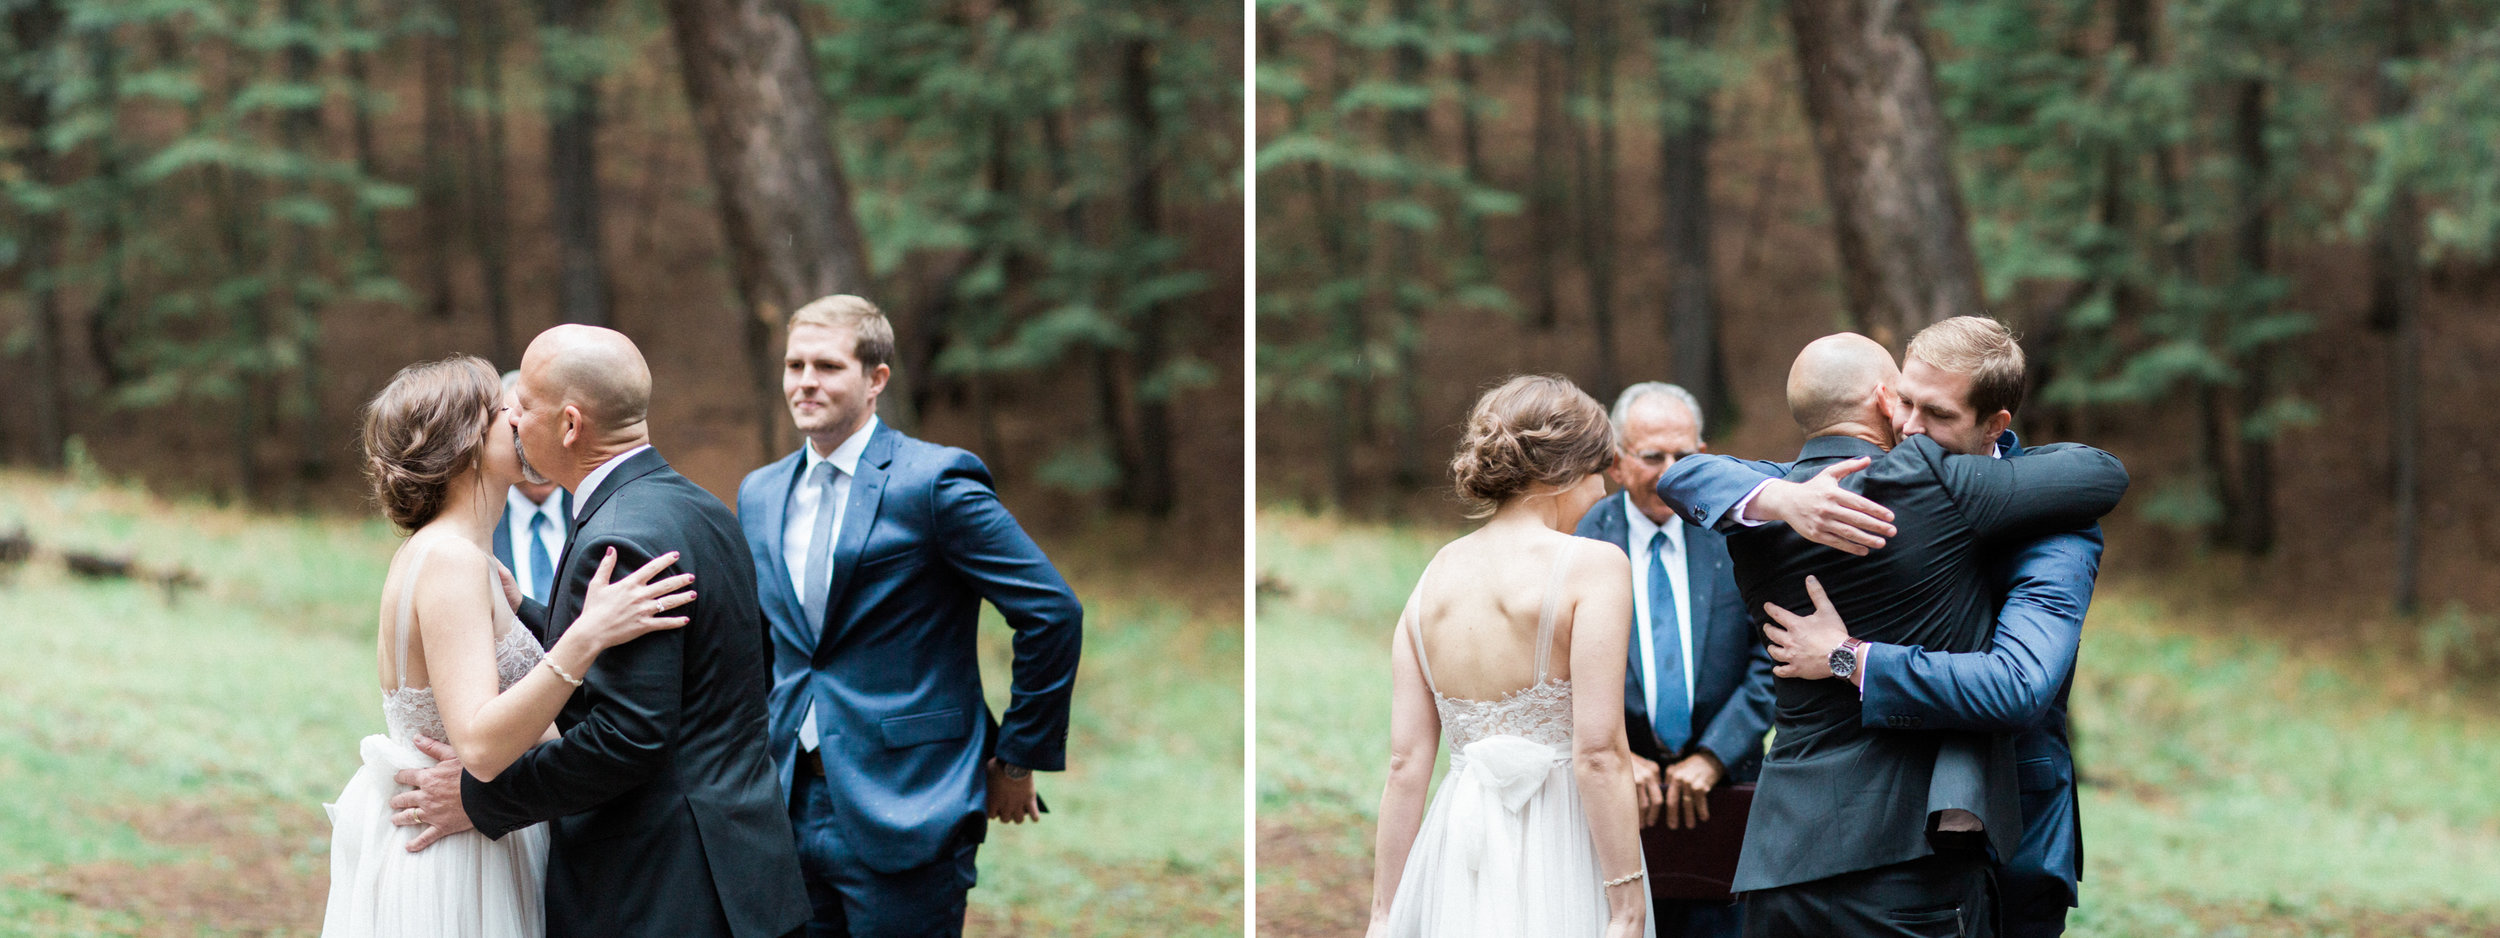 Our Wedding Post_052.JPG